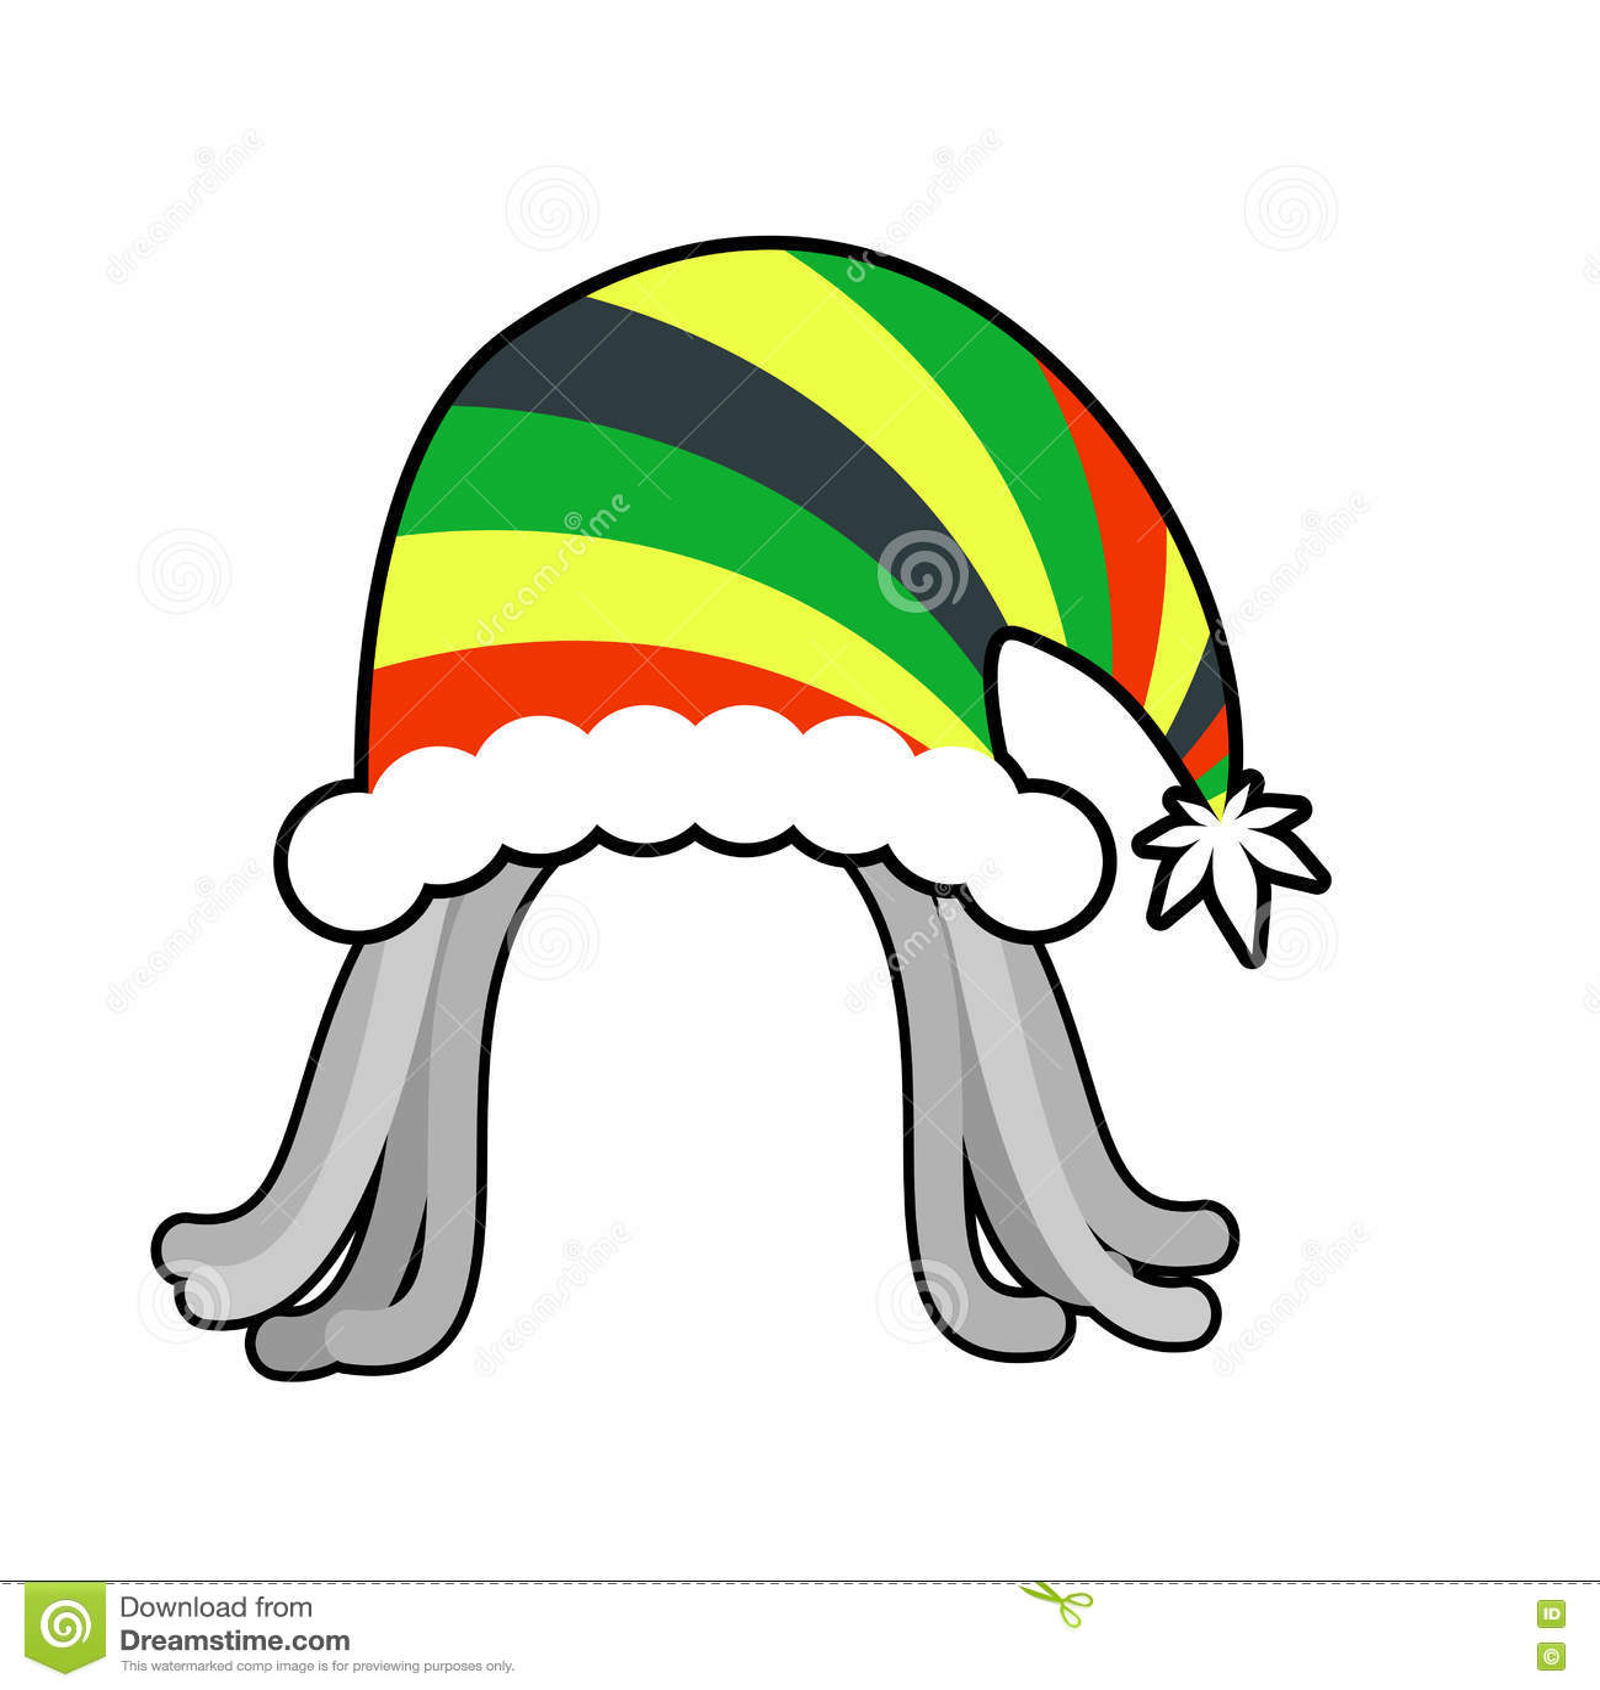 Rasta cap for Santa Claus. Rastaman dreadlocks festive hat. Reggae style  hood for holiday 2e6544da1